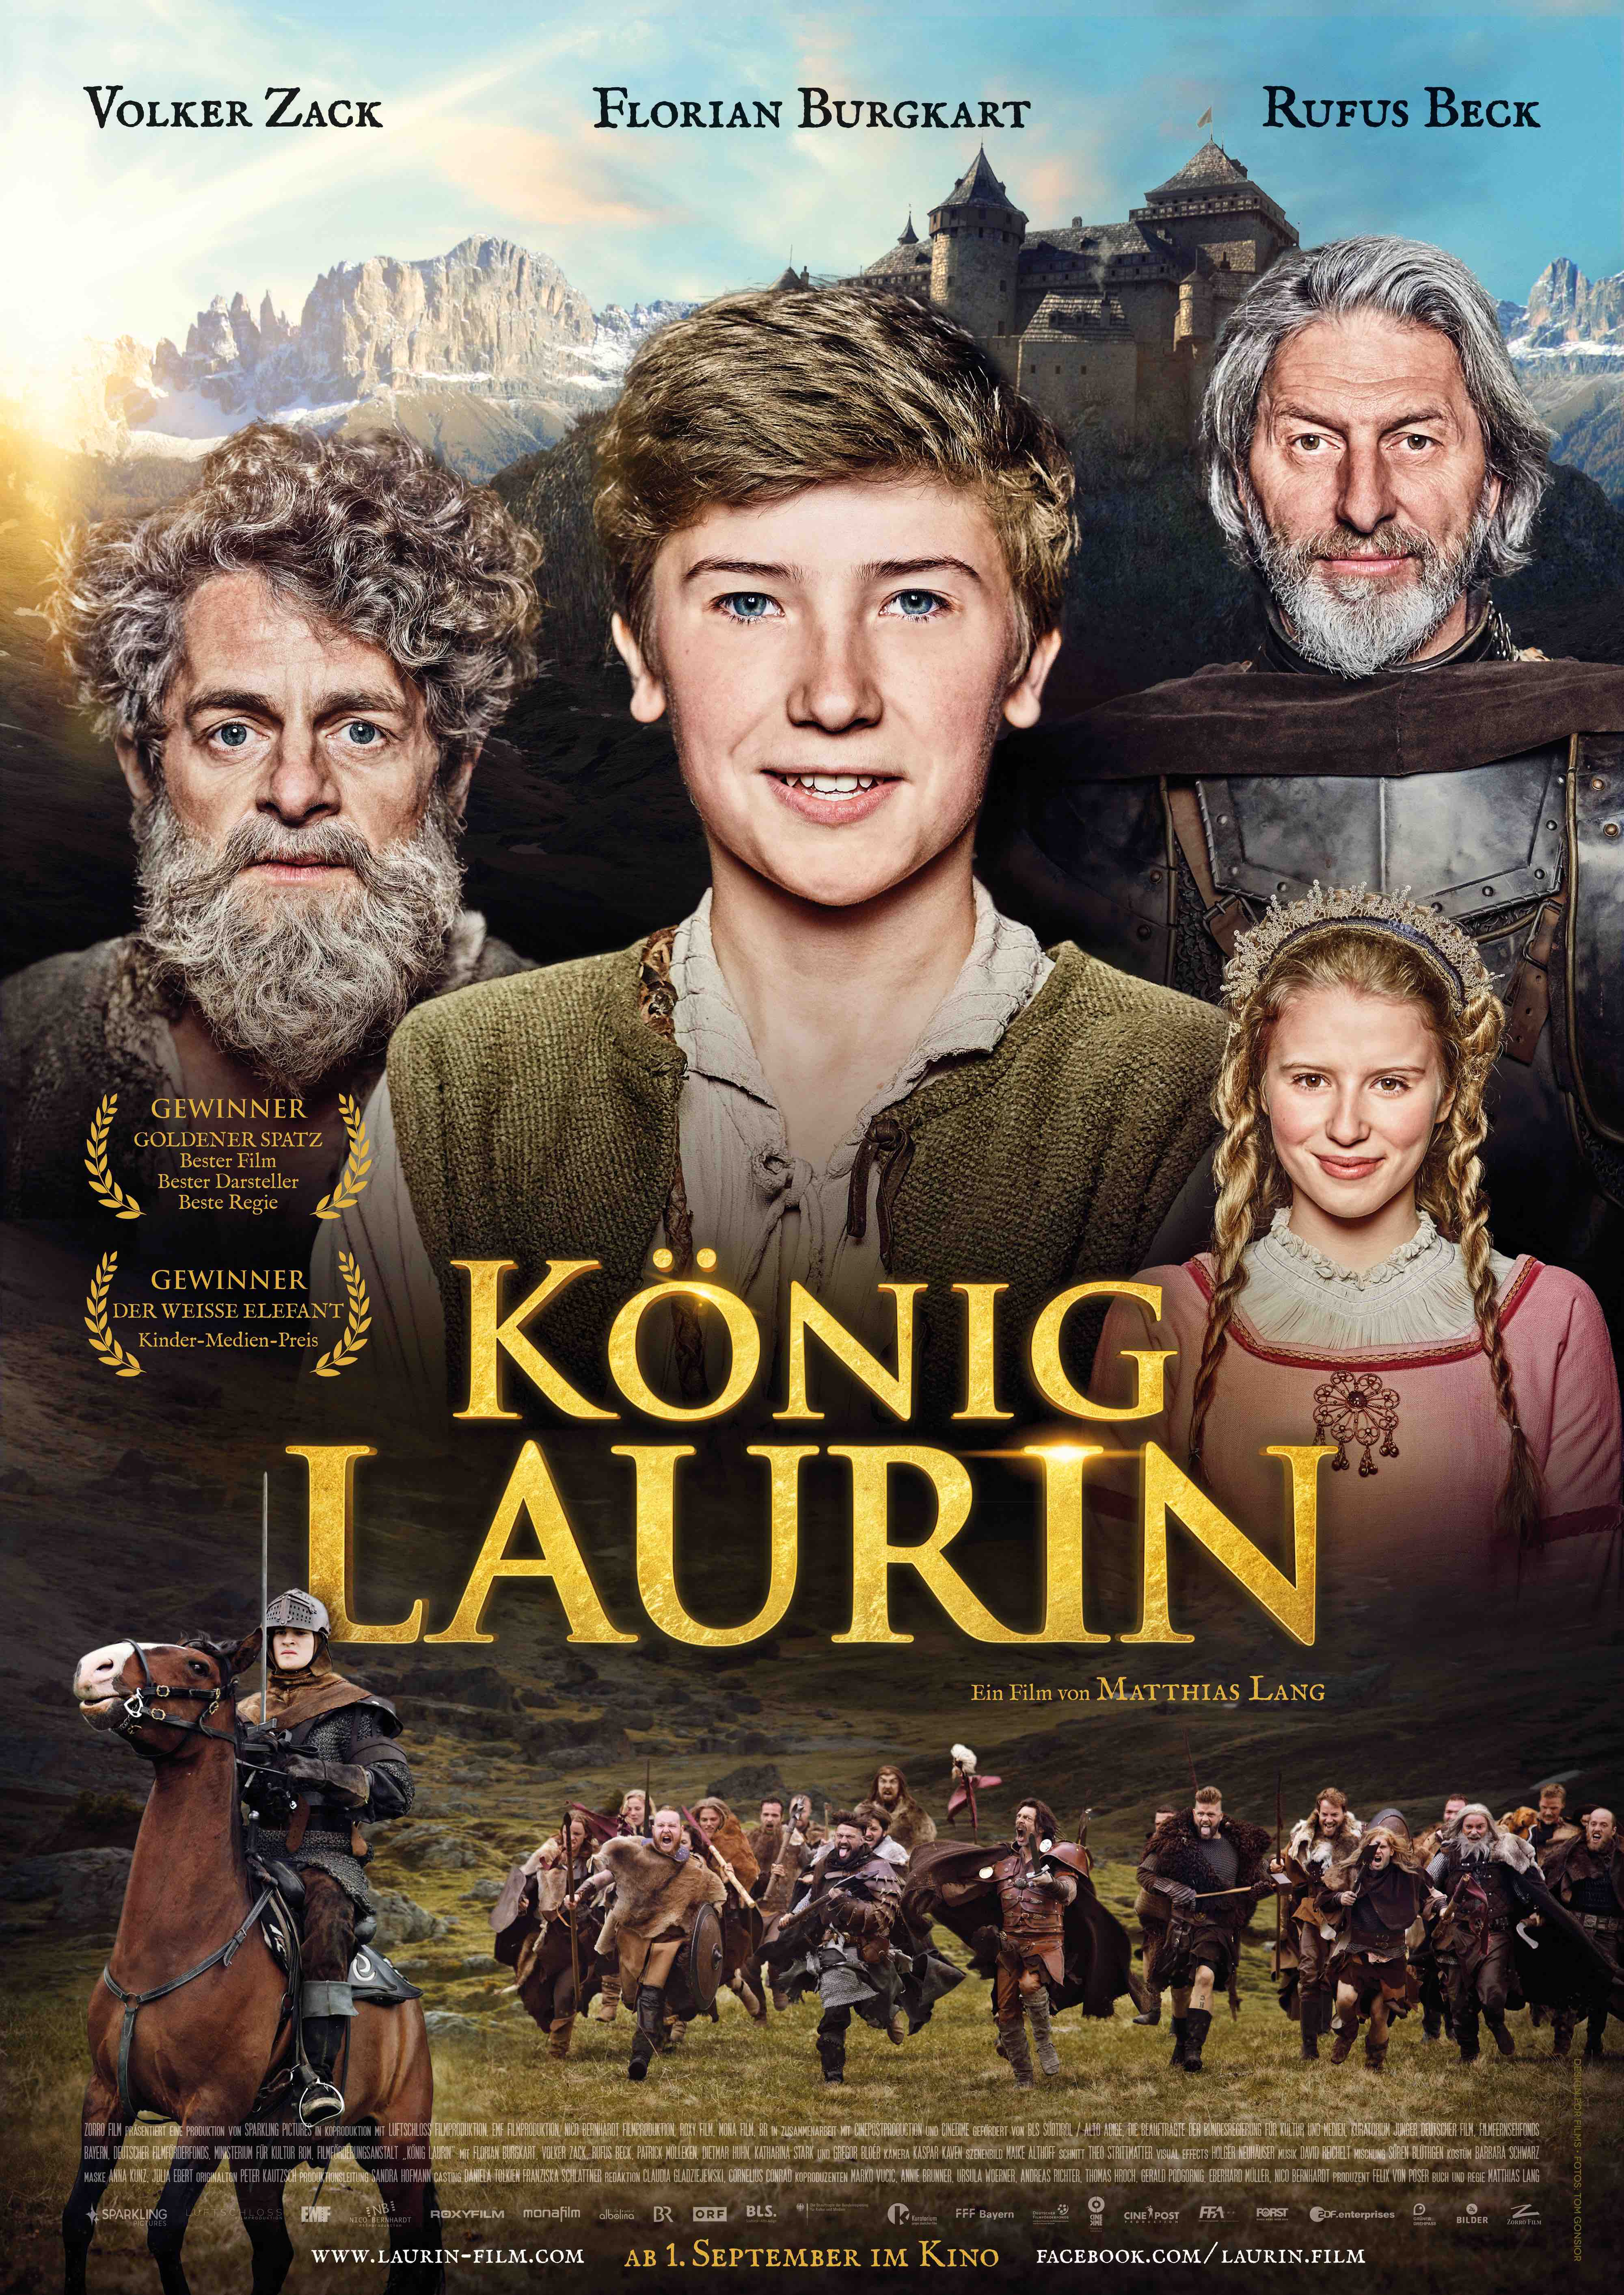 KARALIUS LAURINAS (2016) / König Laurin